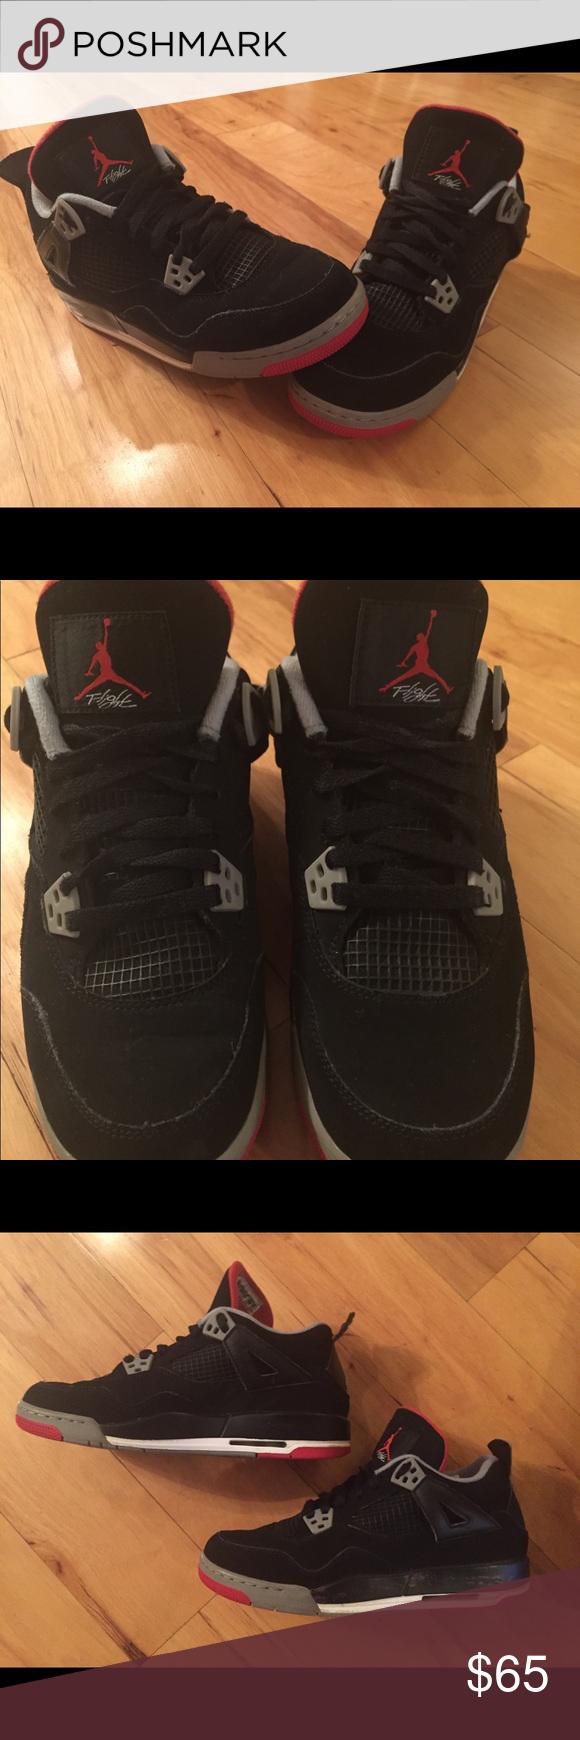 best website d1ebb 82628 Nike Air Jordan IV 4 Retro Black Cement GS Size 7Y Nike 408452-089